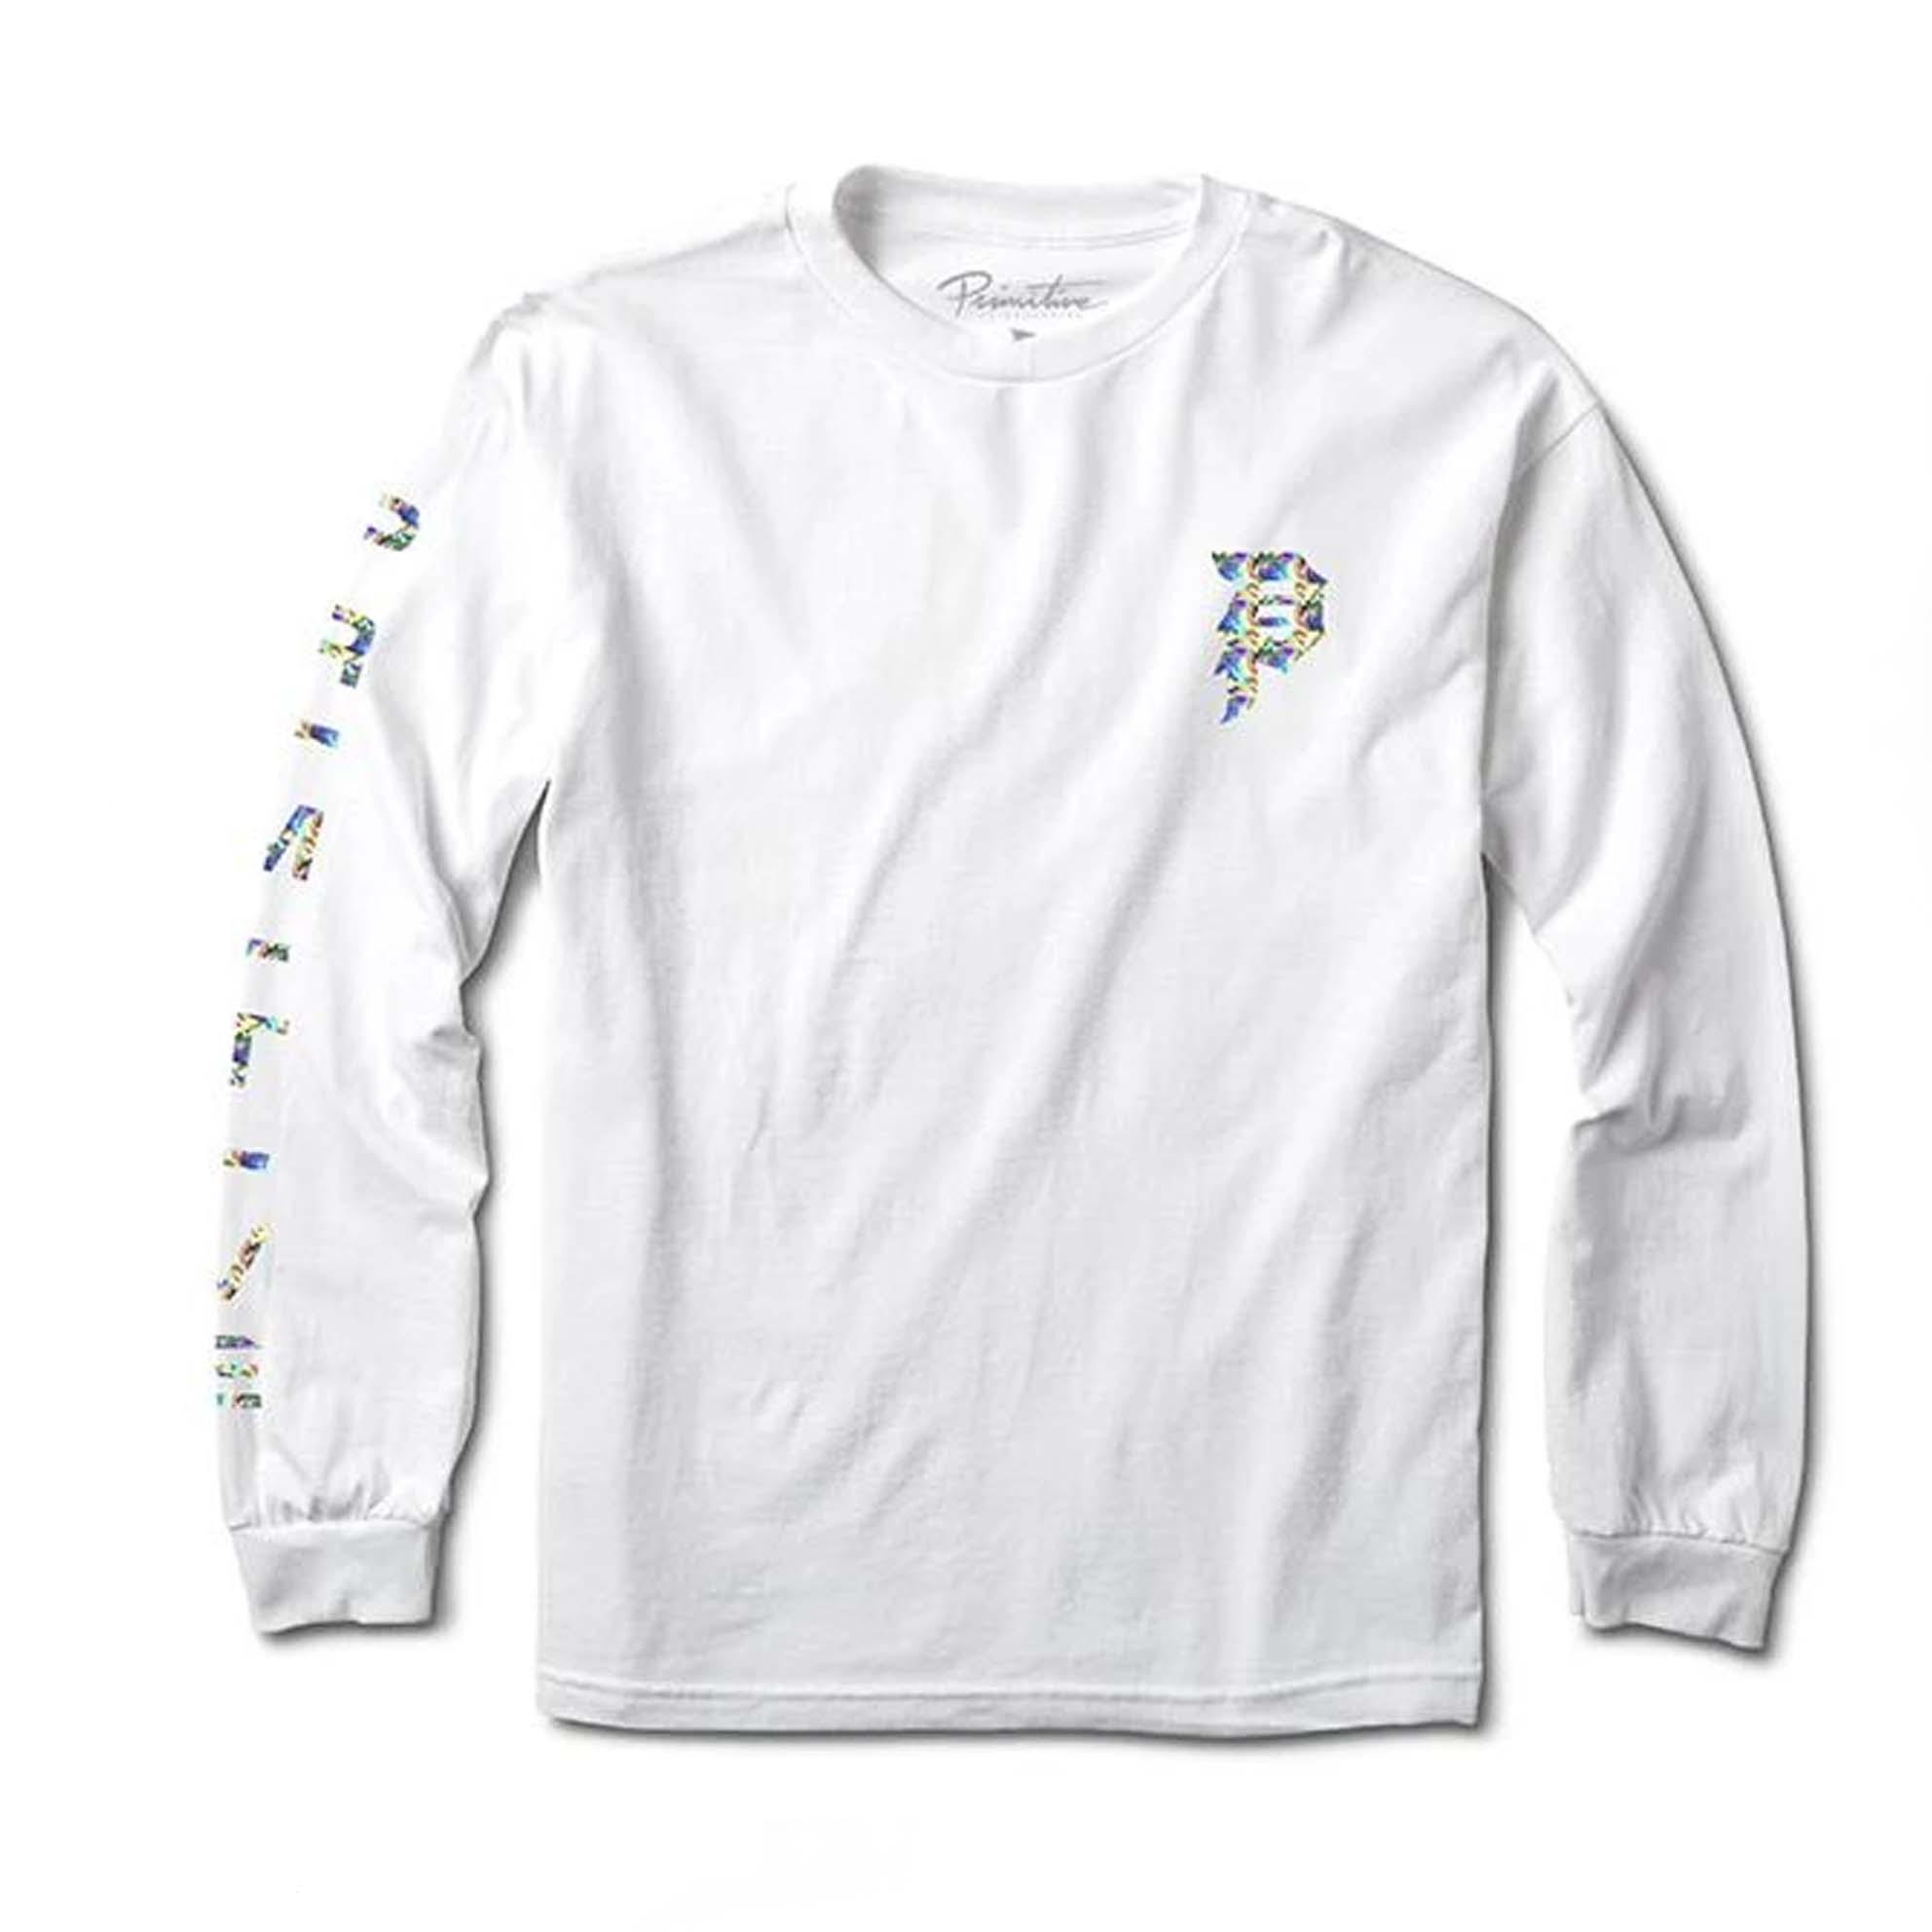 Camiseta Manga Longa Primitive Dirty P Hologram - Branco (Estampa Holográfica/Importado)